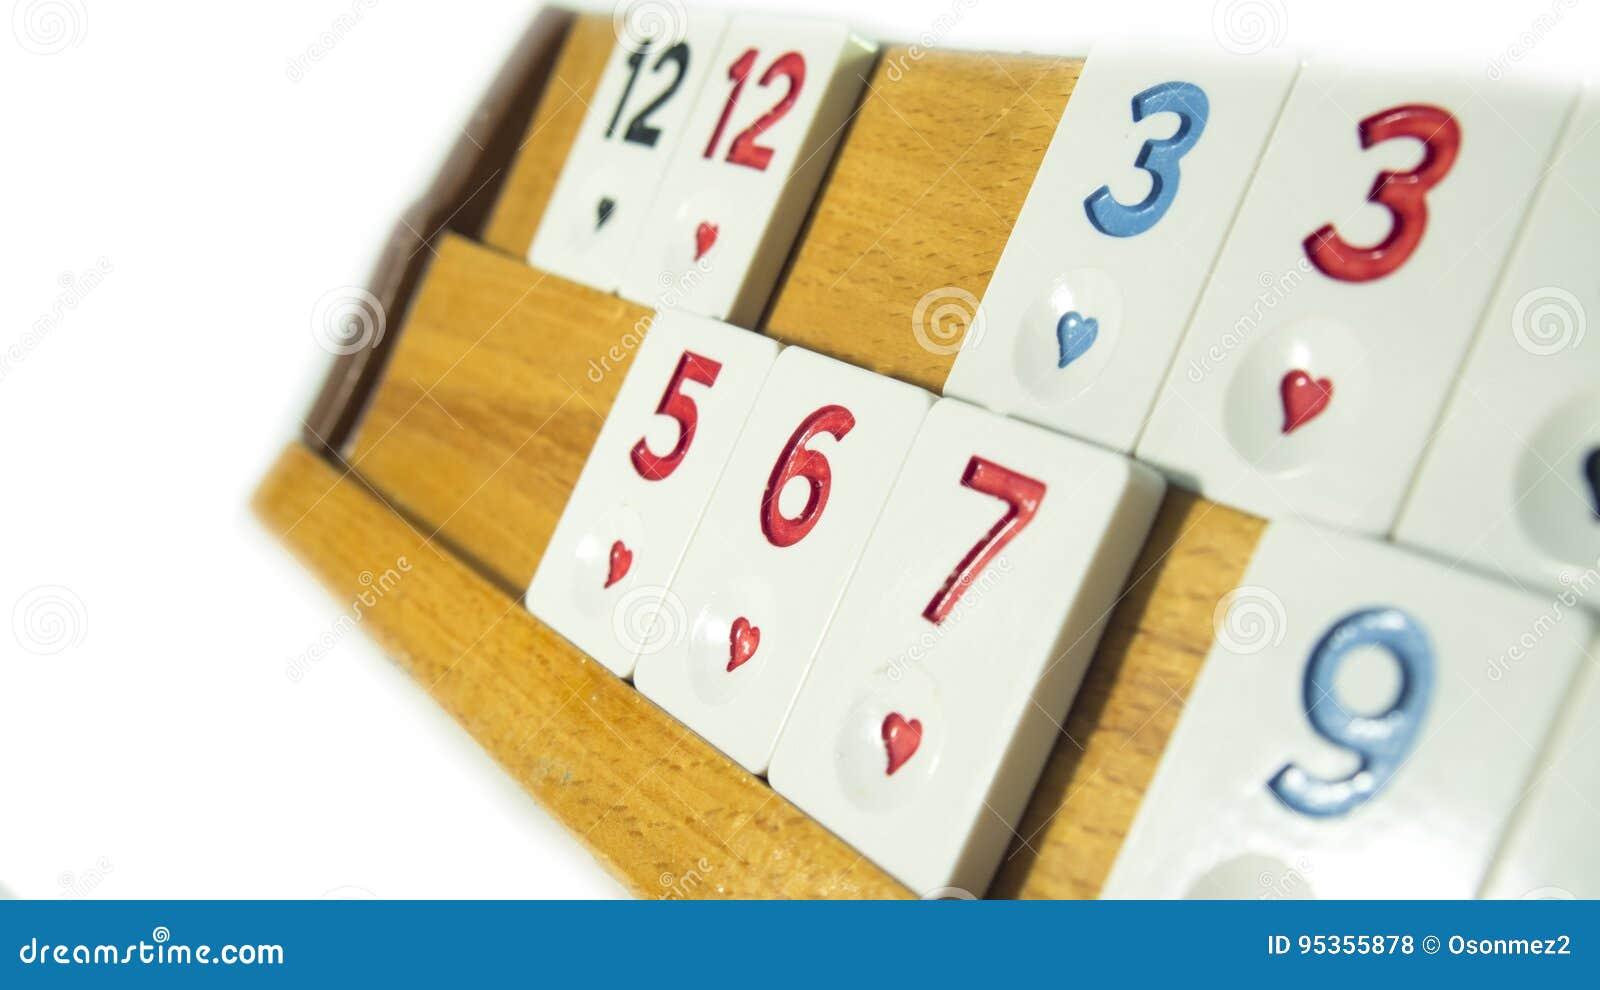 Turkey Okey Game With White Background Stock Photo Image Of Player